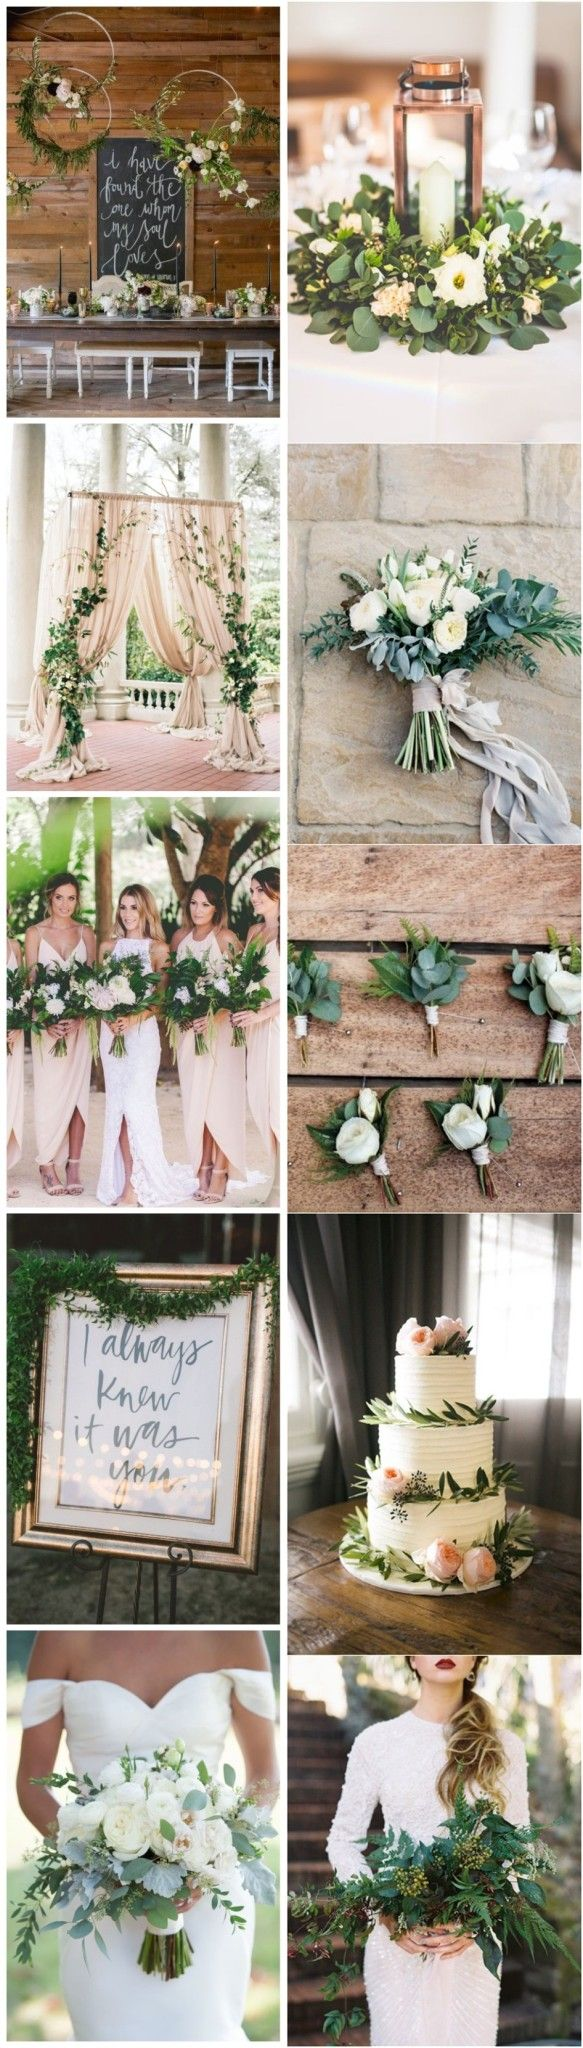 Home » Spring Weddings » 2017 Spring Wedding Color and Ideas » Greenery wedding color ideas 2017